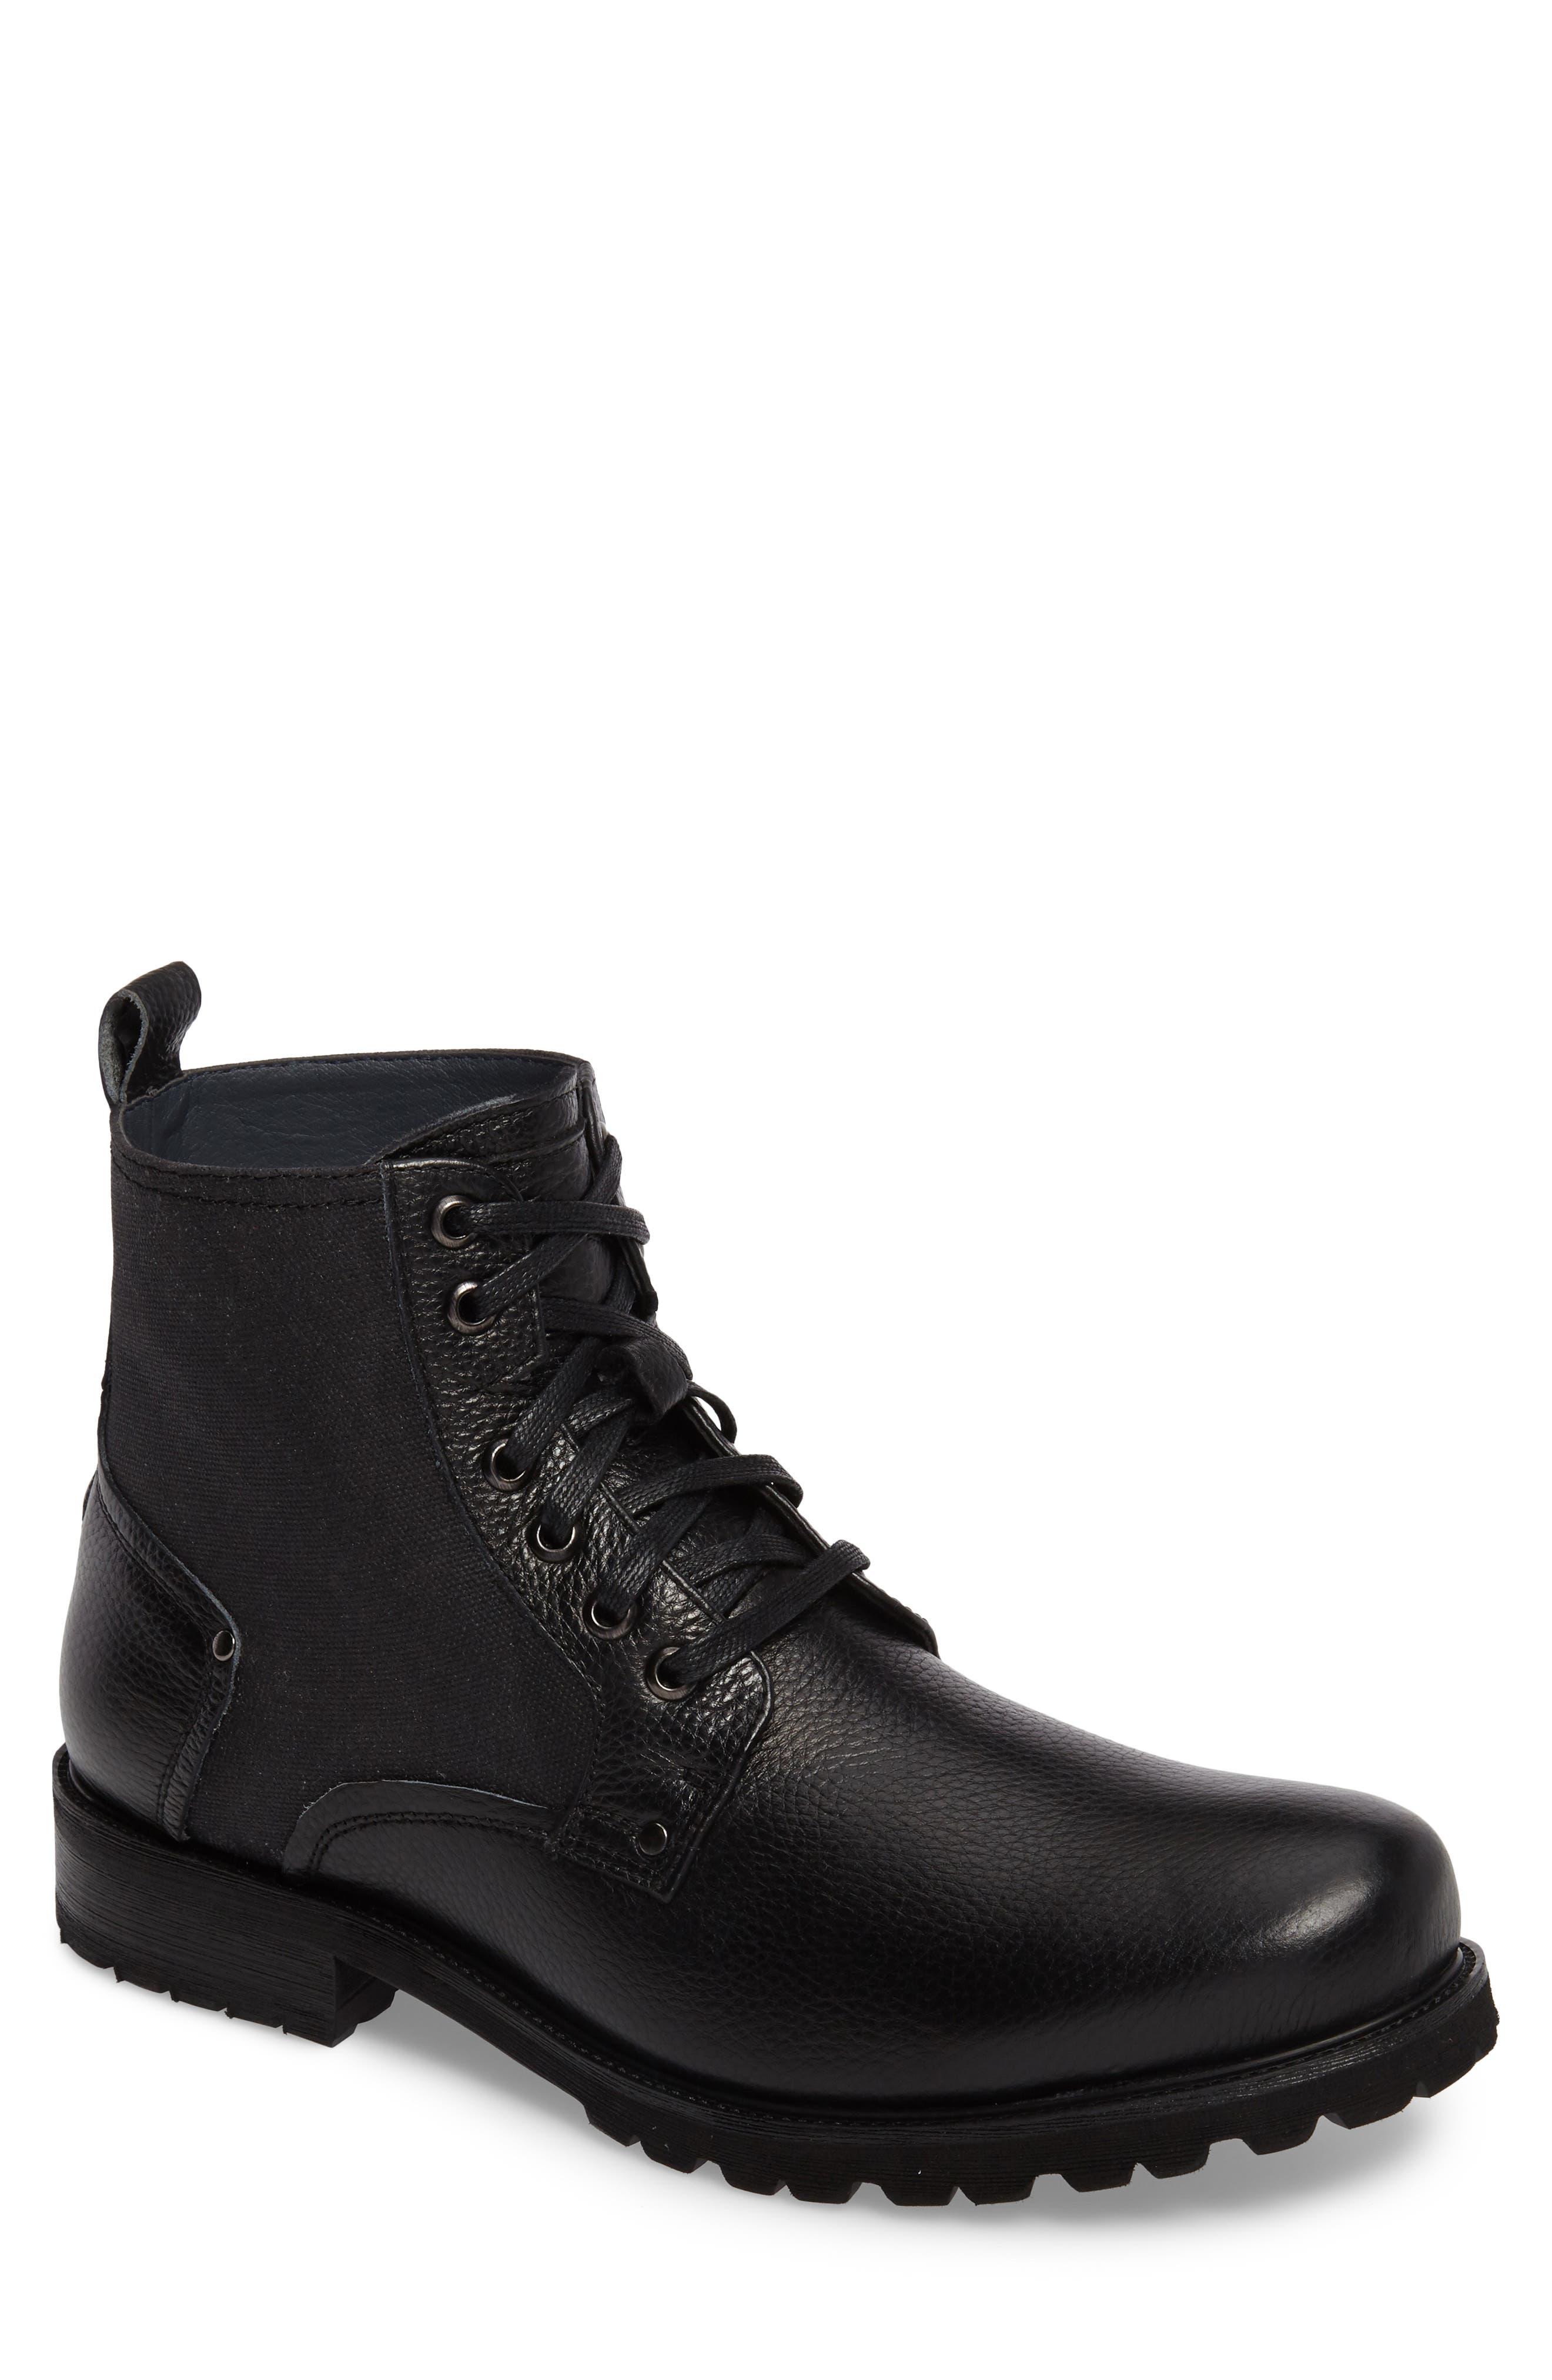 Whitley Plain Toe Boot,                         Main,                         color,